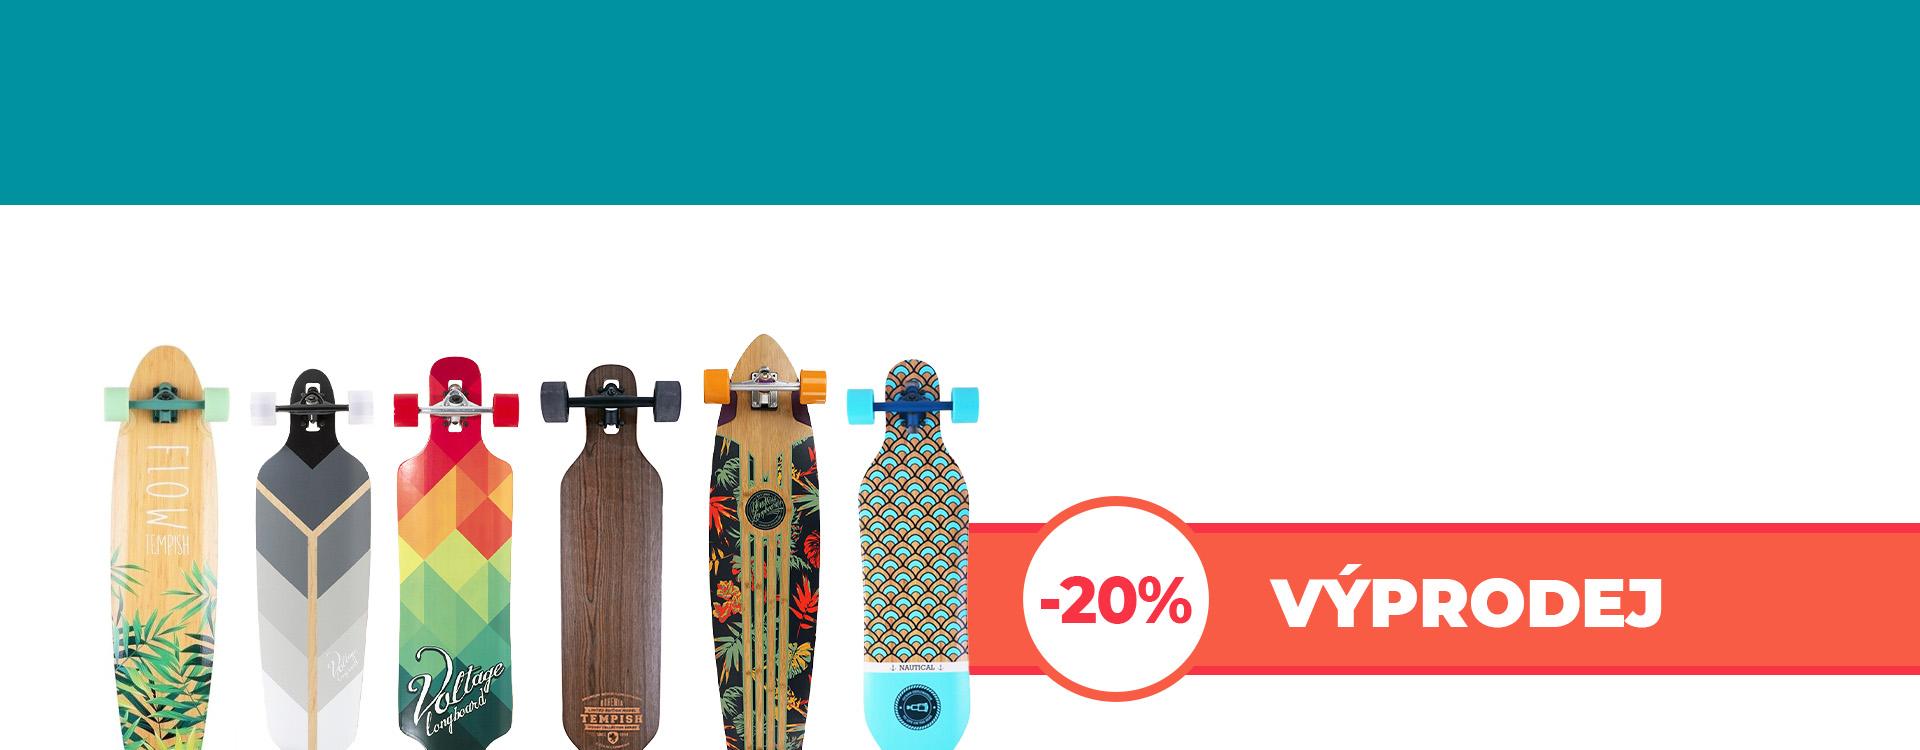 Výprodej podzim 2021 longboard desktop